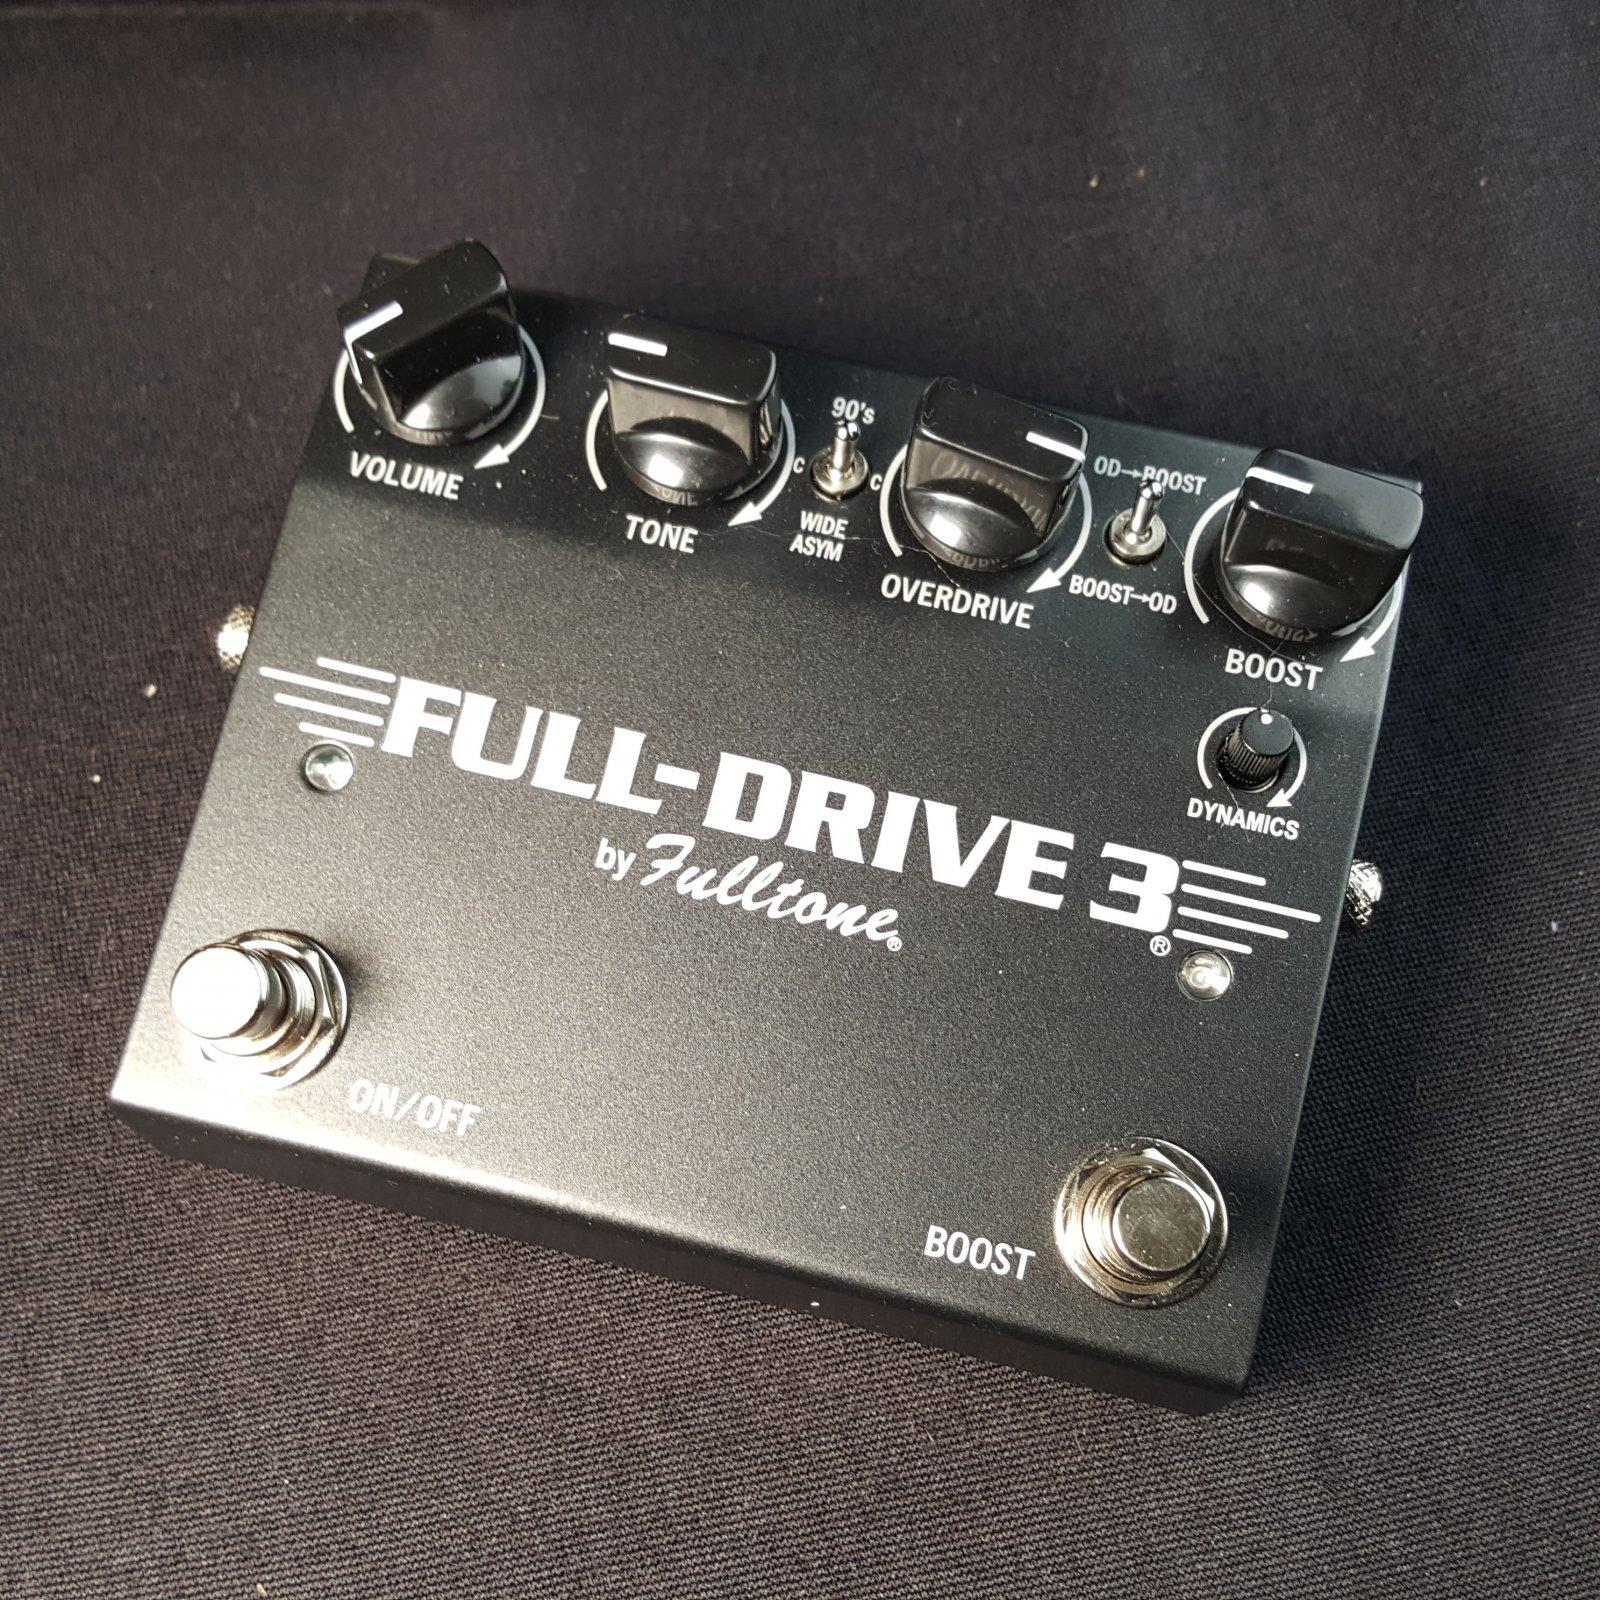 USED Fulltone Full Drive 3 Guitar Effects Drive Pedal